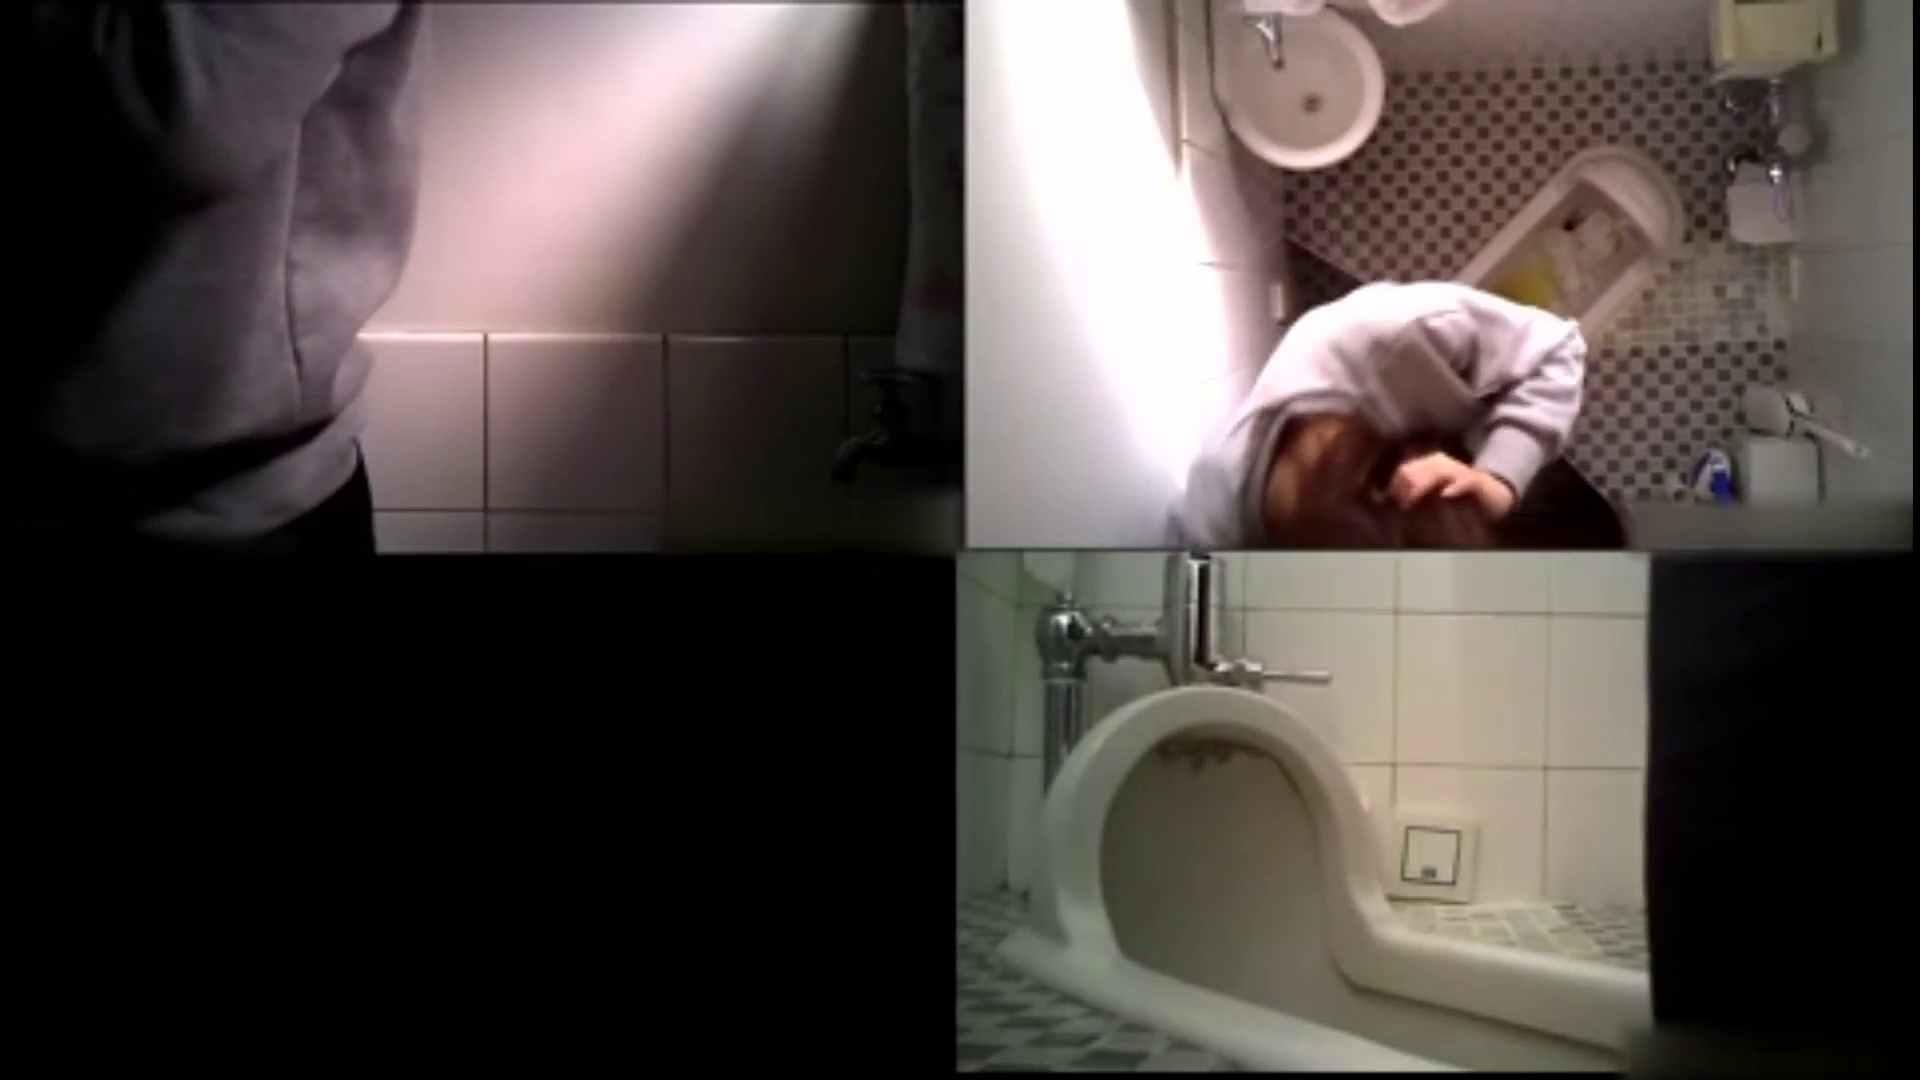 Vol.05 花の女子大生 トイレ恥態 進化系マルチアングル!! 女子大生  80pic 48